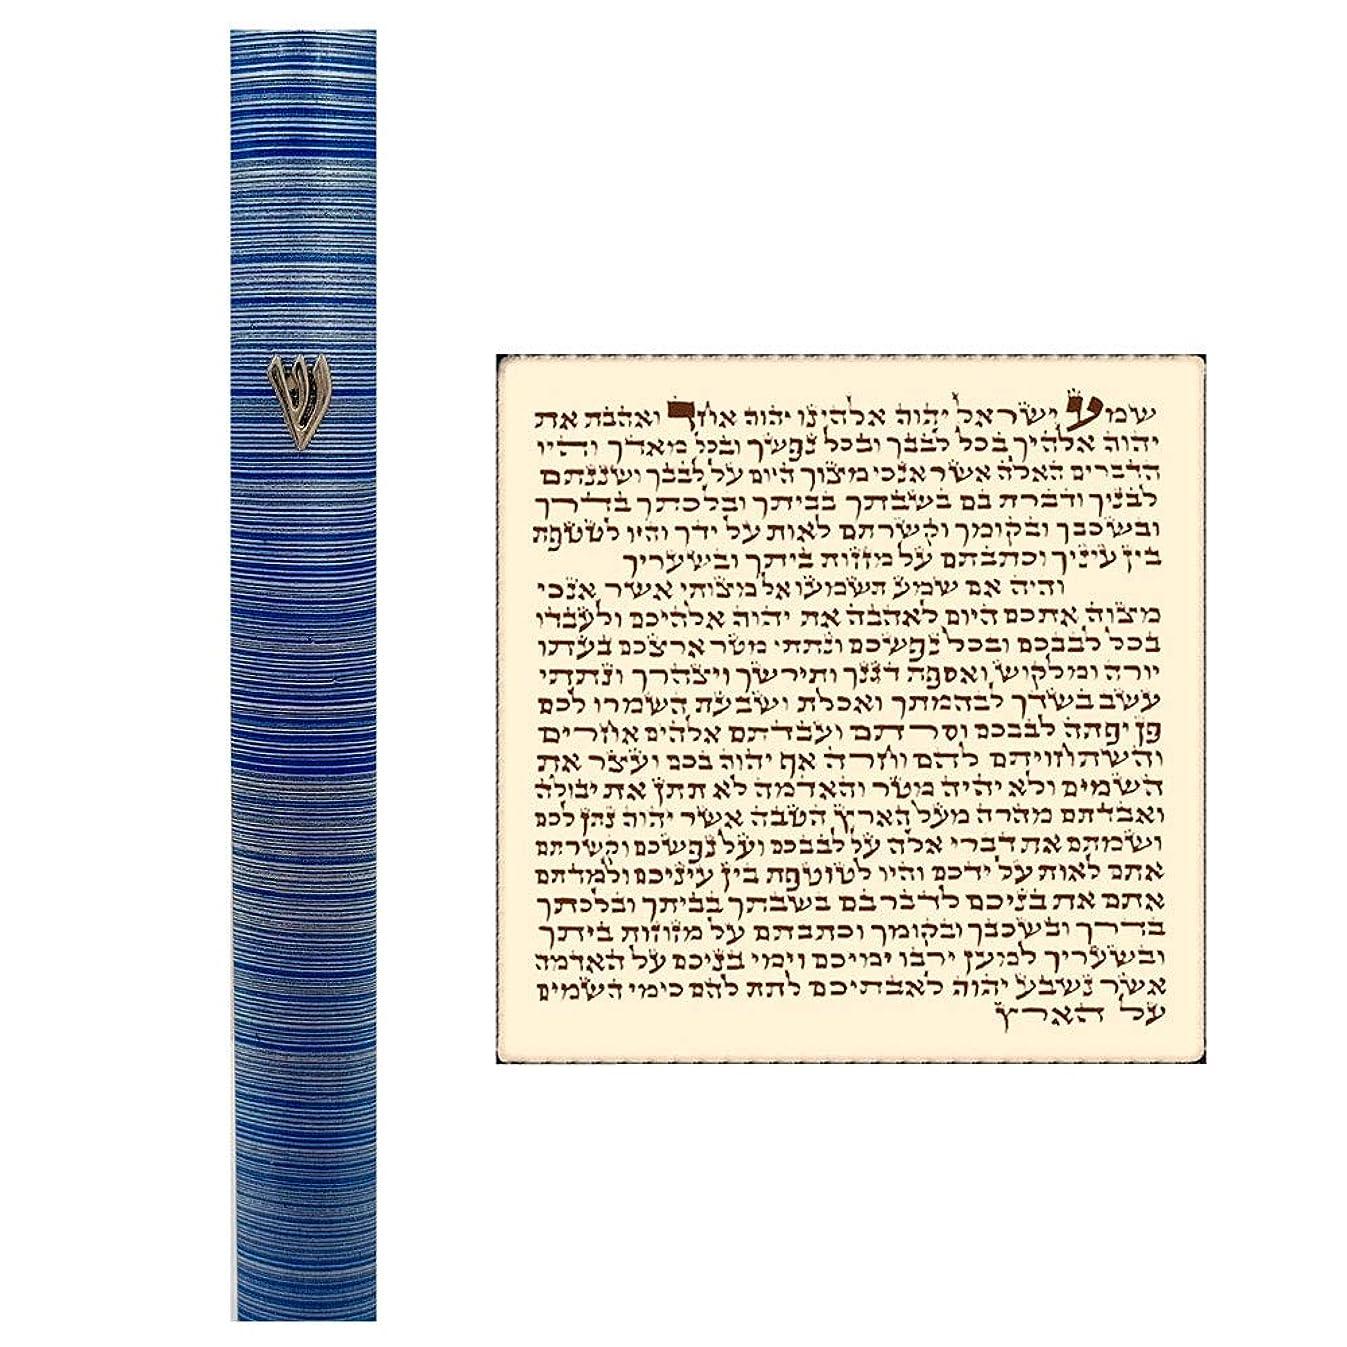 Talisman4U Aluminum Jewish MEZUZAH CASE with Prayer Scroll 3D Metal Painted Blue Stripes Design Art Judaica Door Mezuza Made in Israel 5